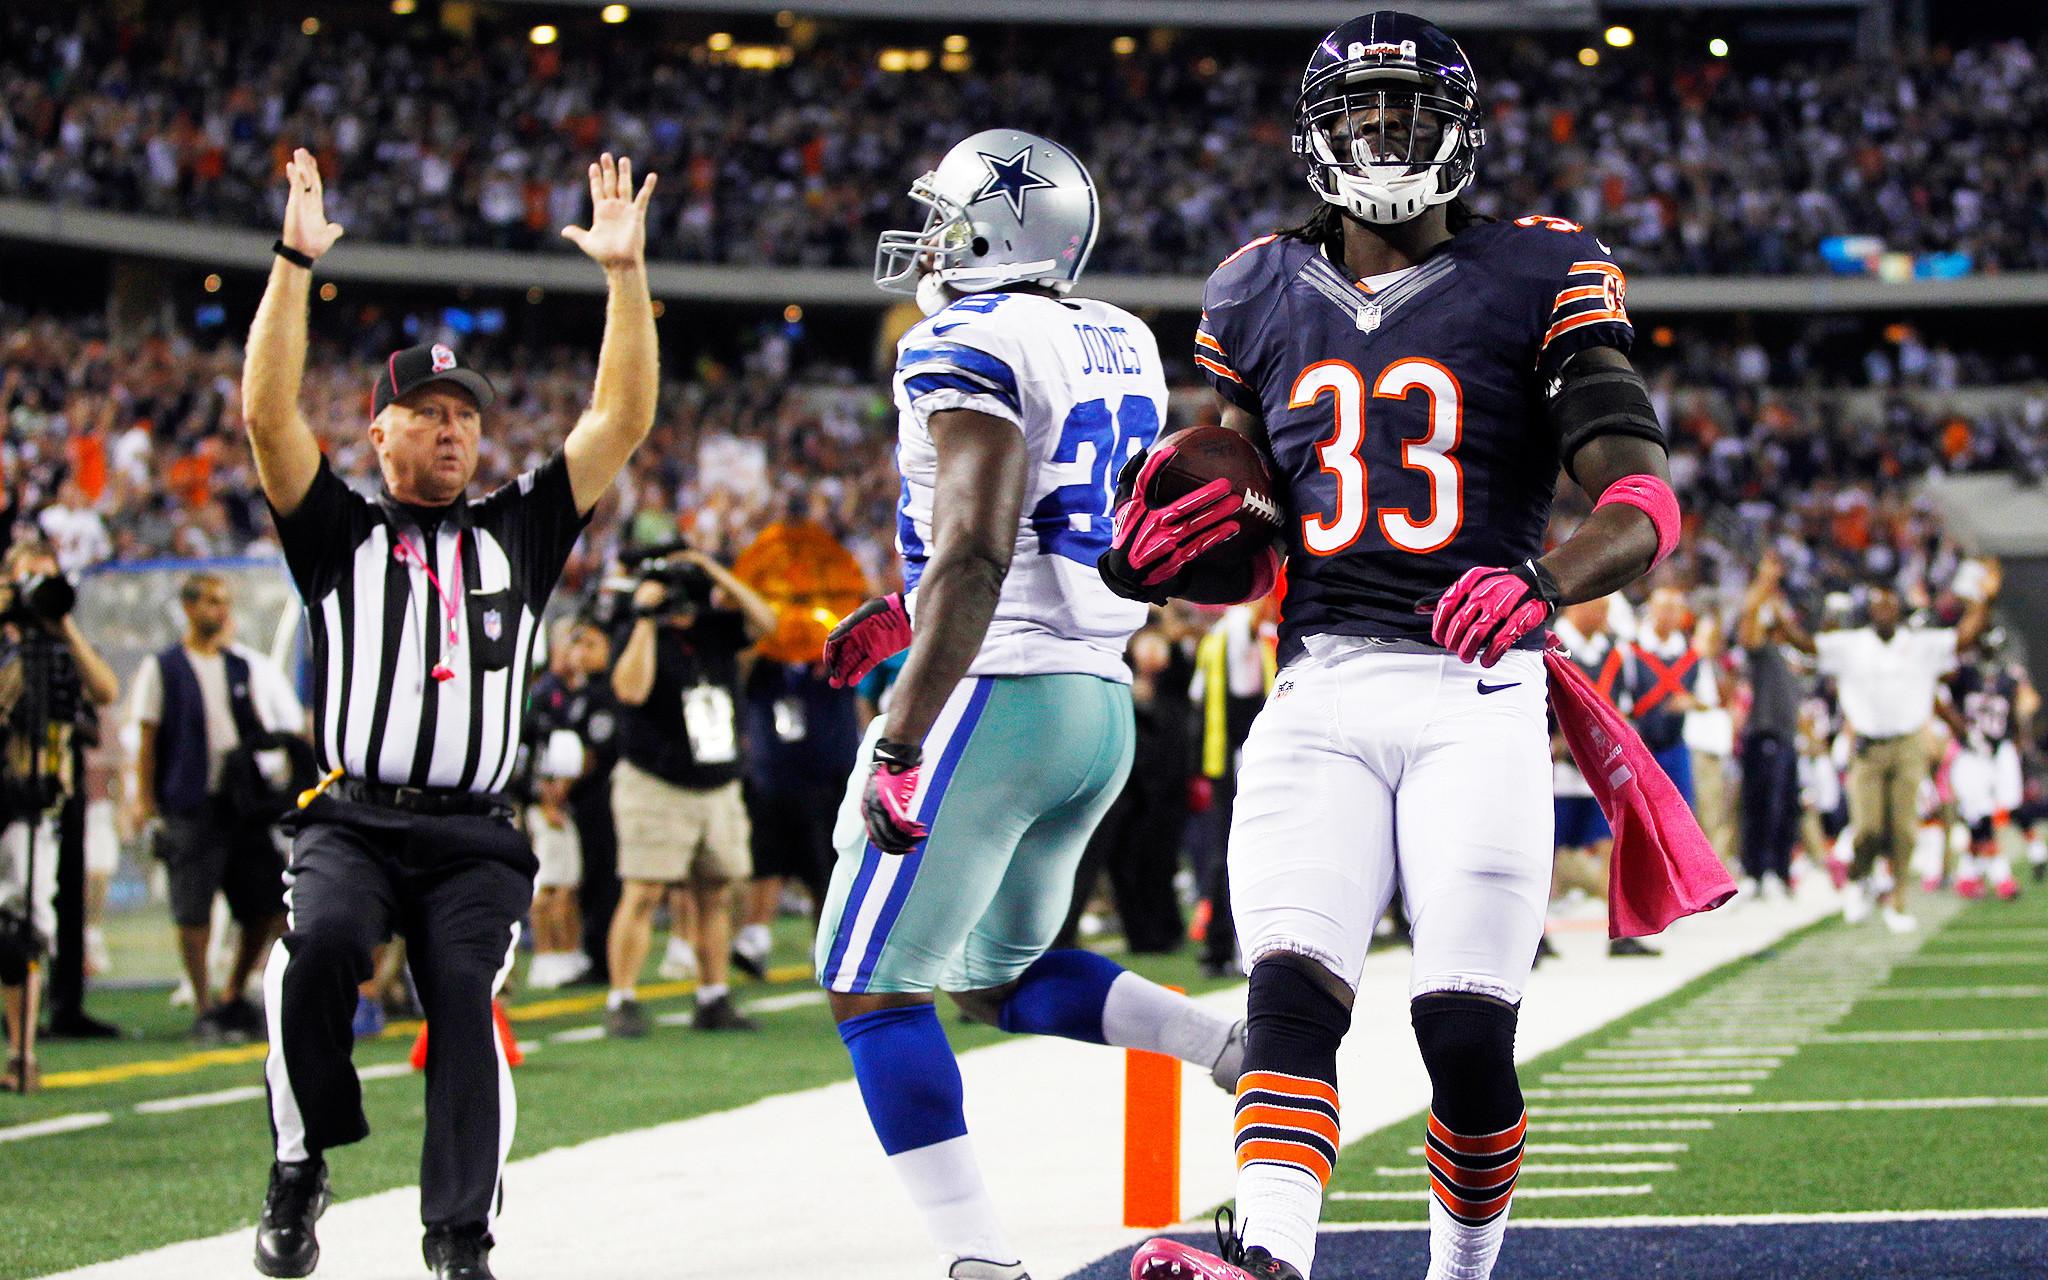 Res: 2048x1280, Cowboys vs. Bears